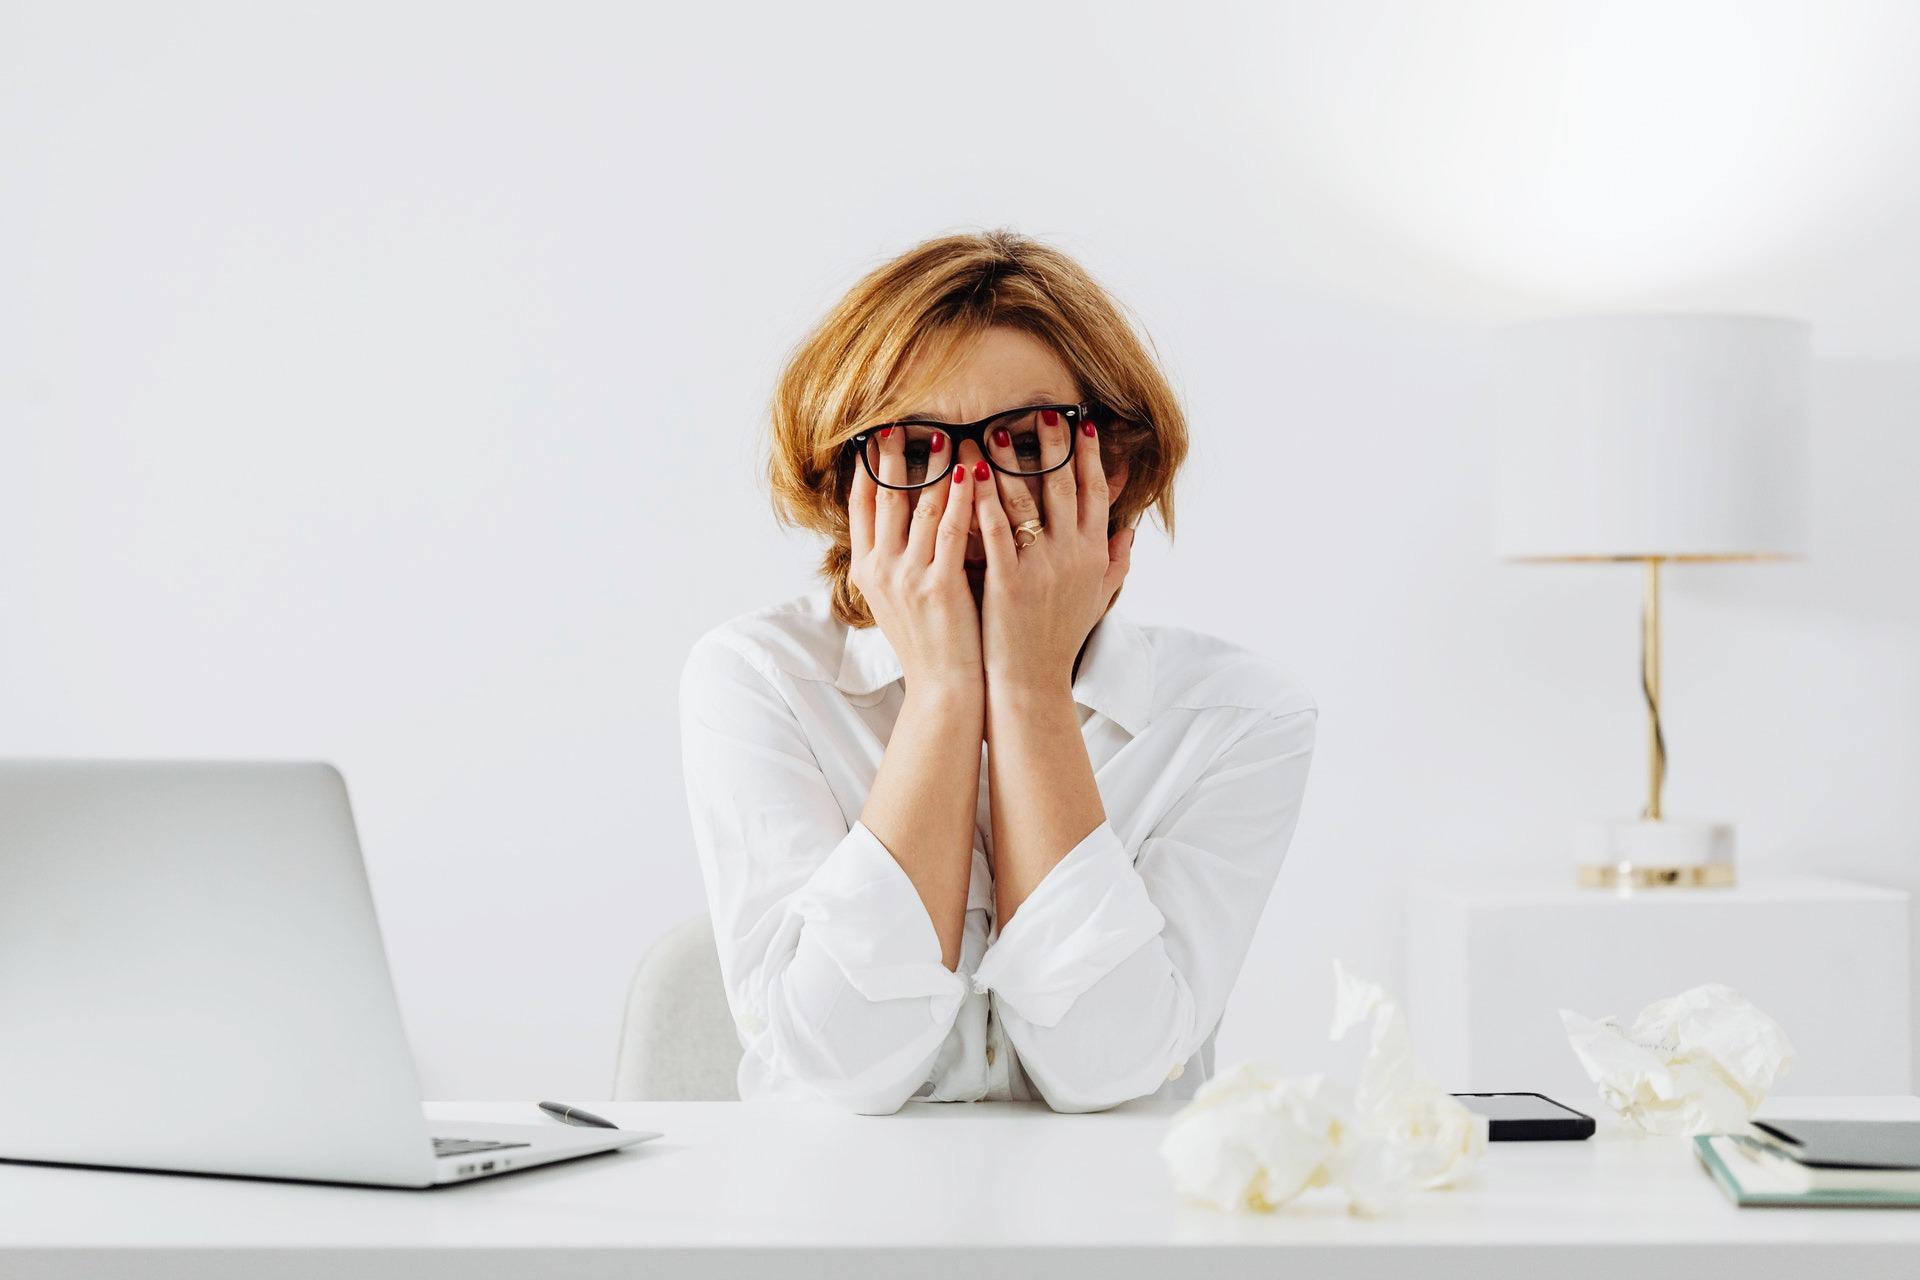 Psychosomatic symptoms of stress